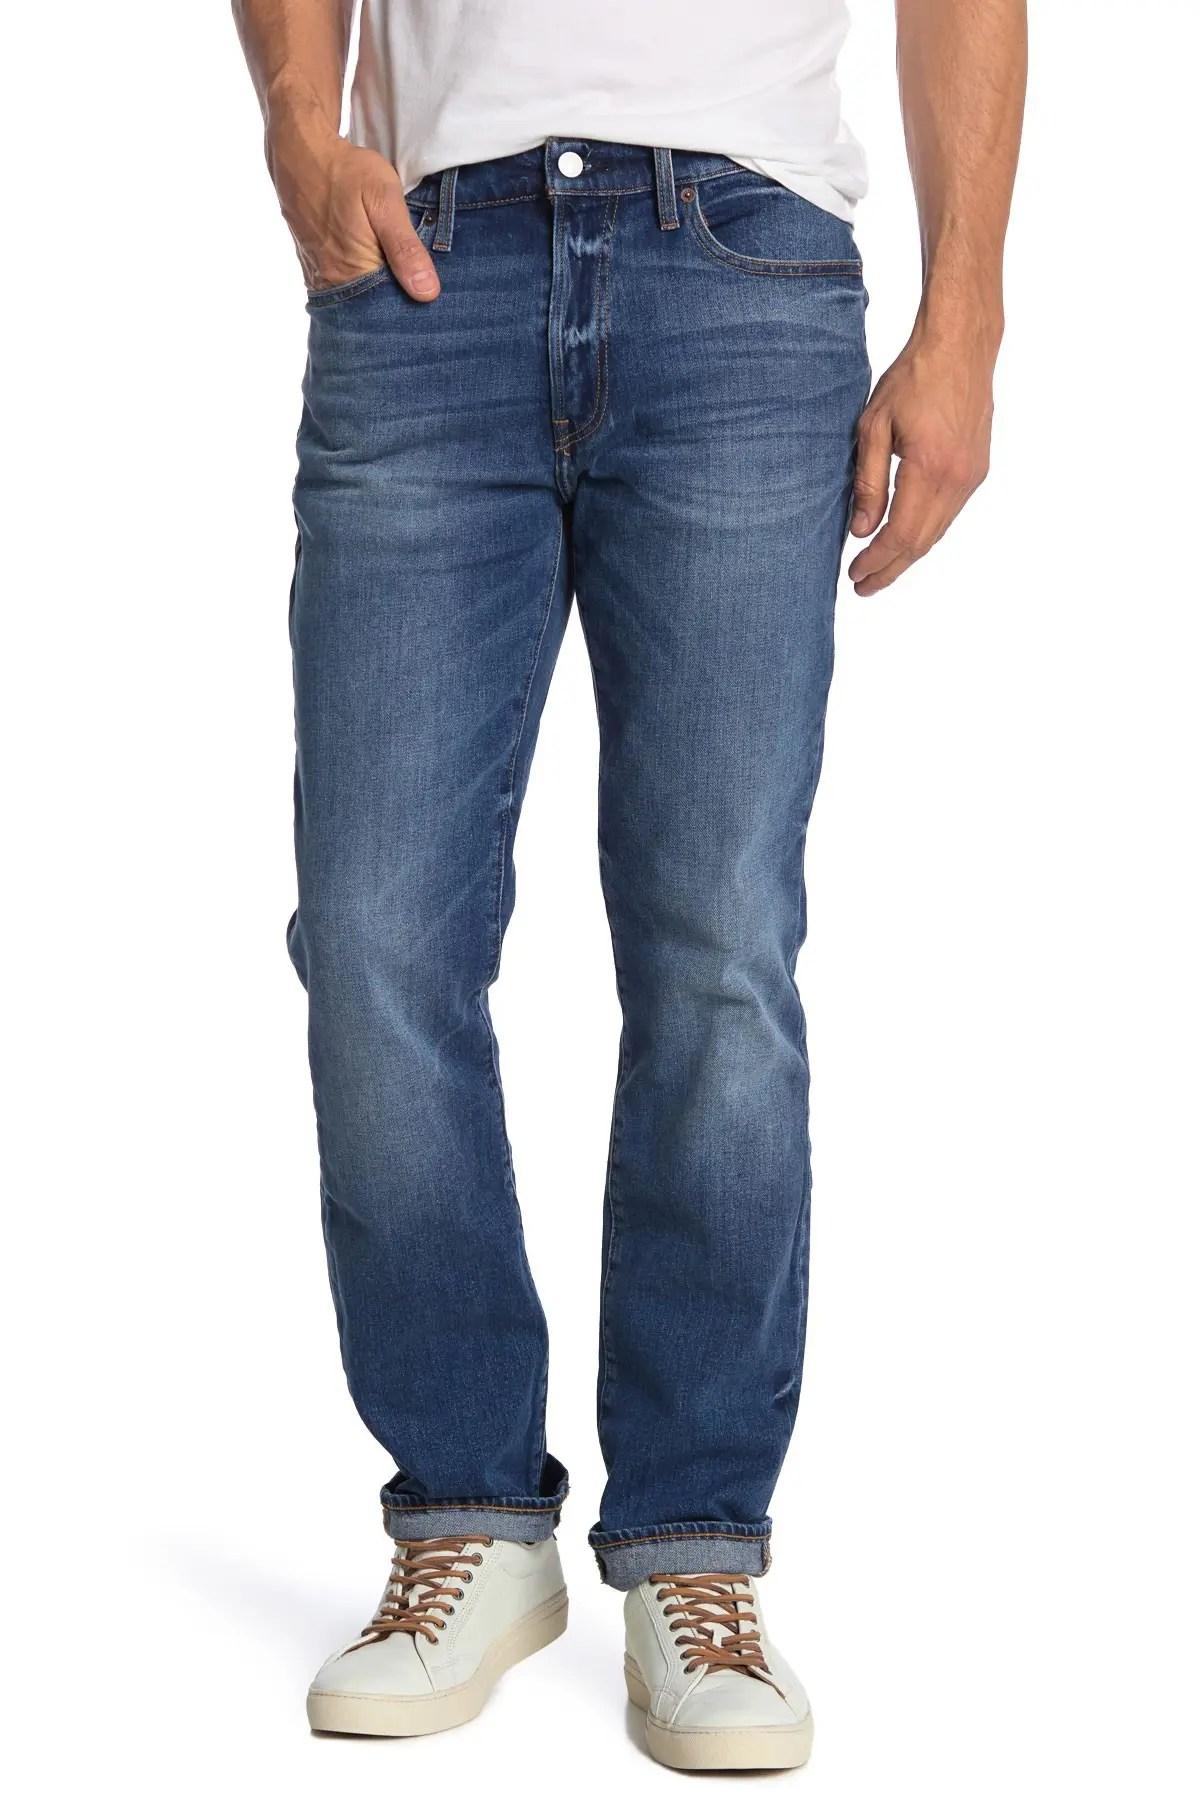 lucky brand 121 slim straight cut jeans 30 34 inseam nordstrom rack